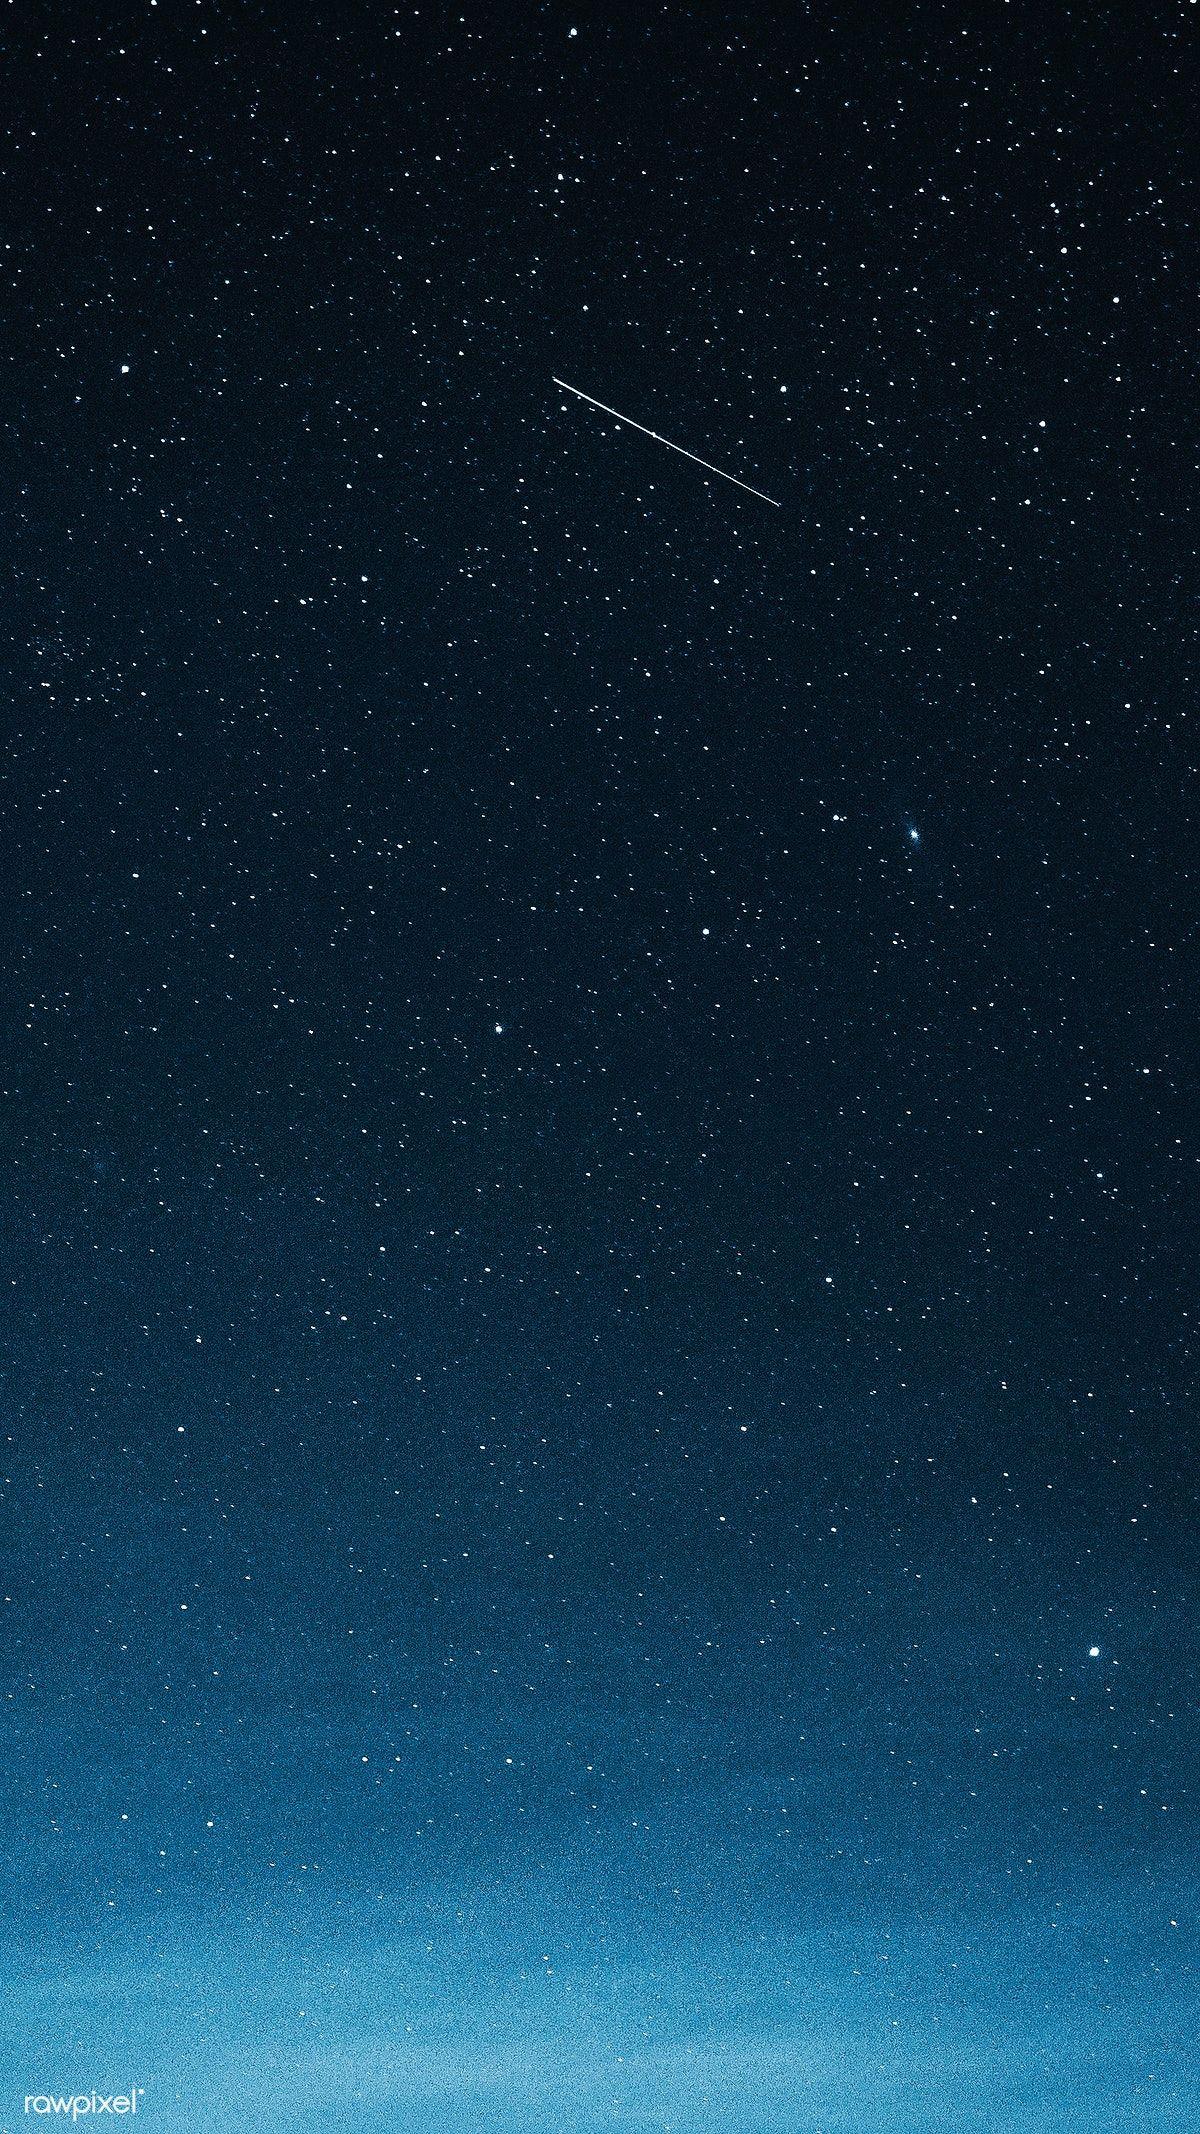 Shooting Star In The Dark Blue Sky Over Greenland Premium Image By Rawpixel Com Luke Stackpoole Dark Blue Wallpaper Blue Sky Wallpaper Blue Aesthetic Dark